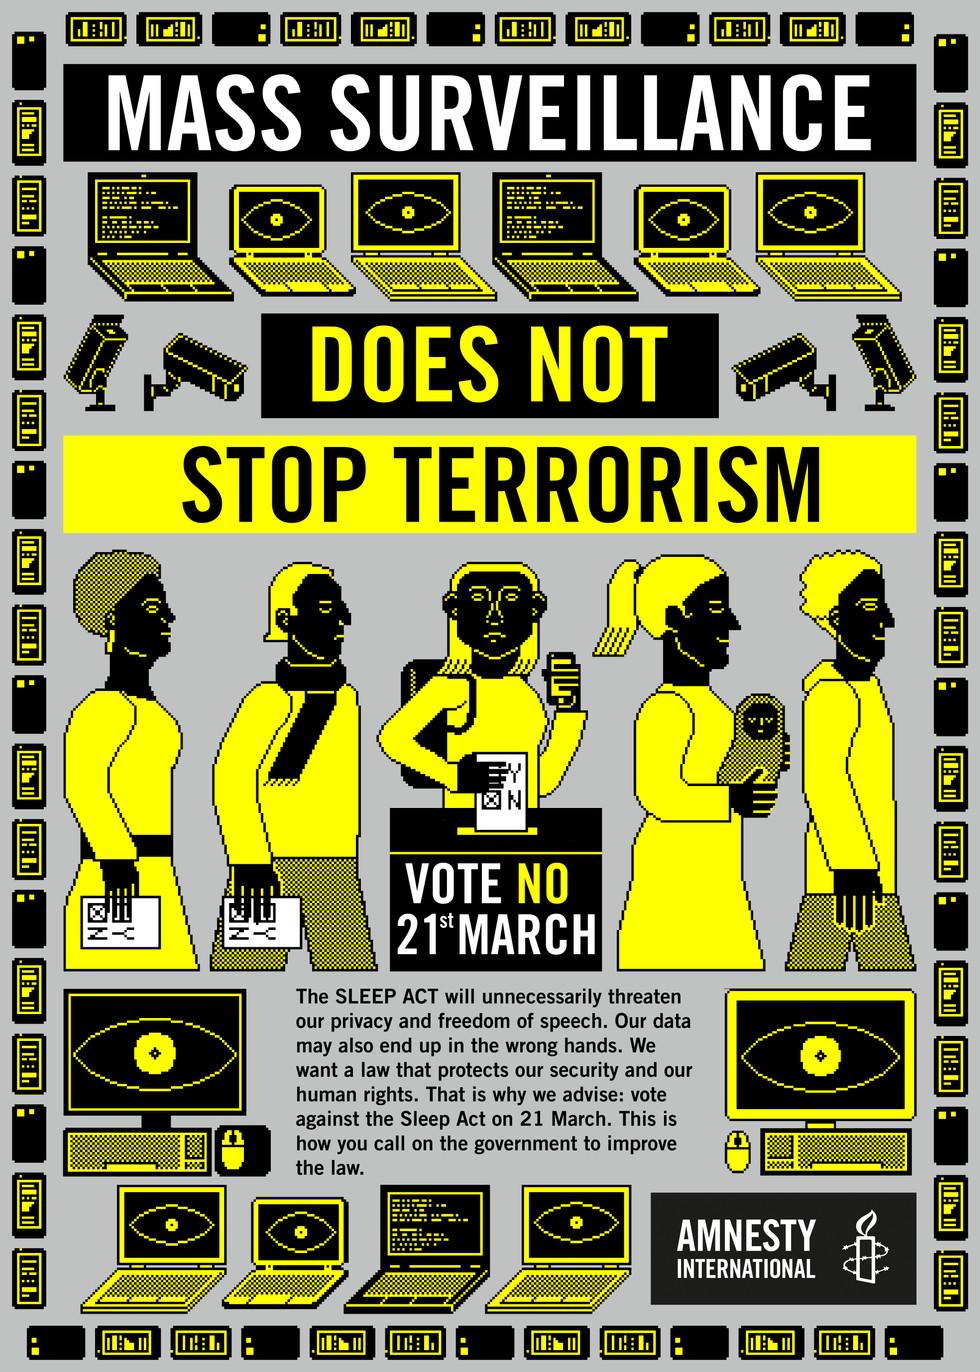 Mass surveillance does not stop terrorism